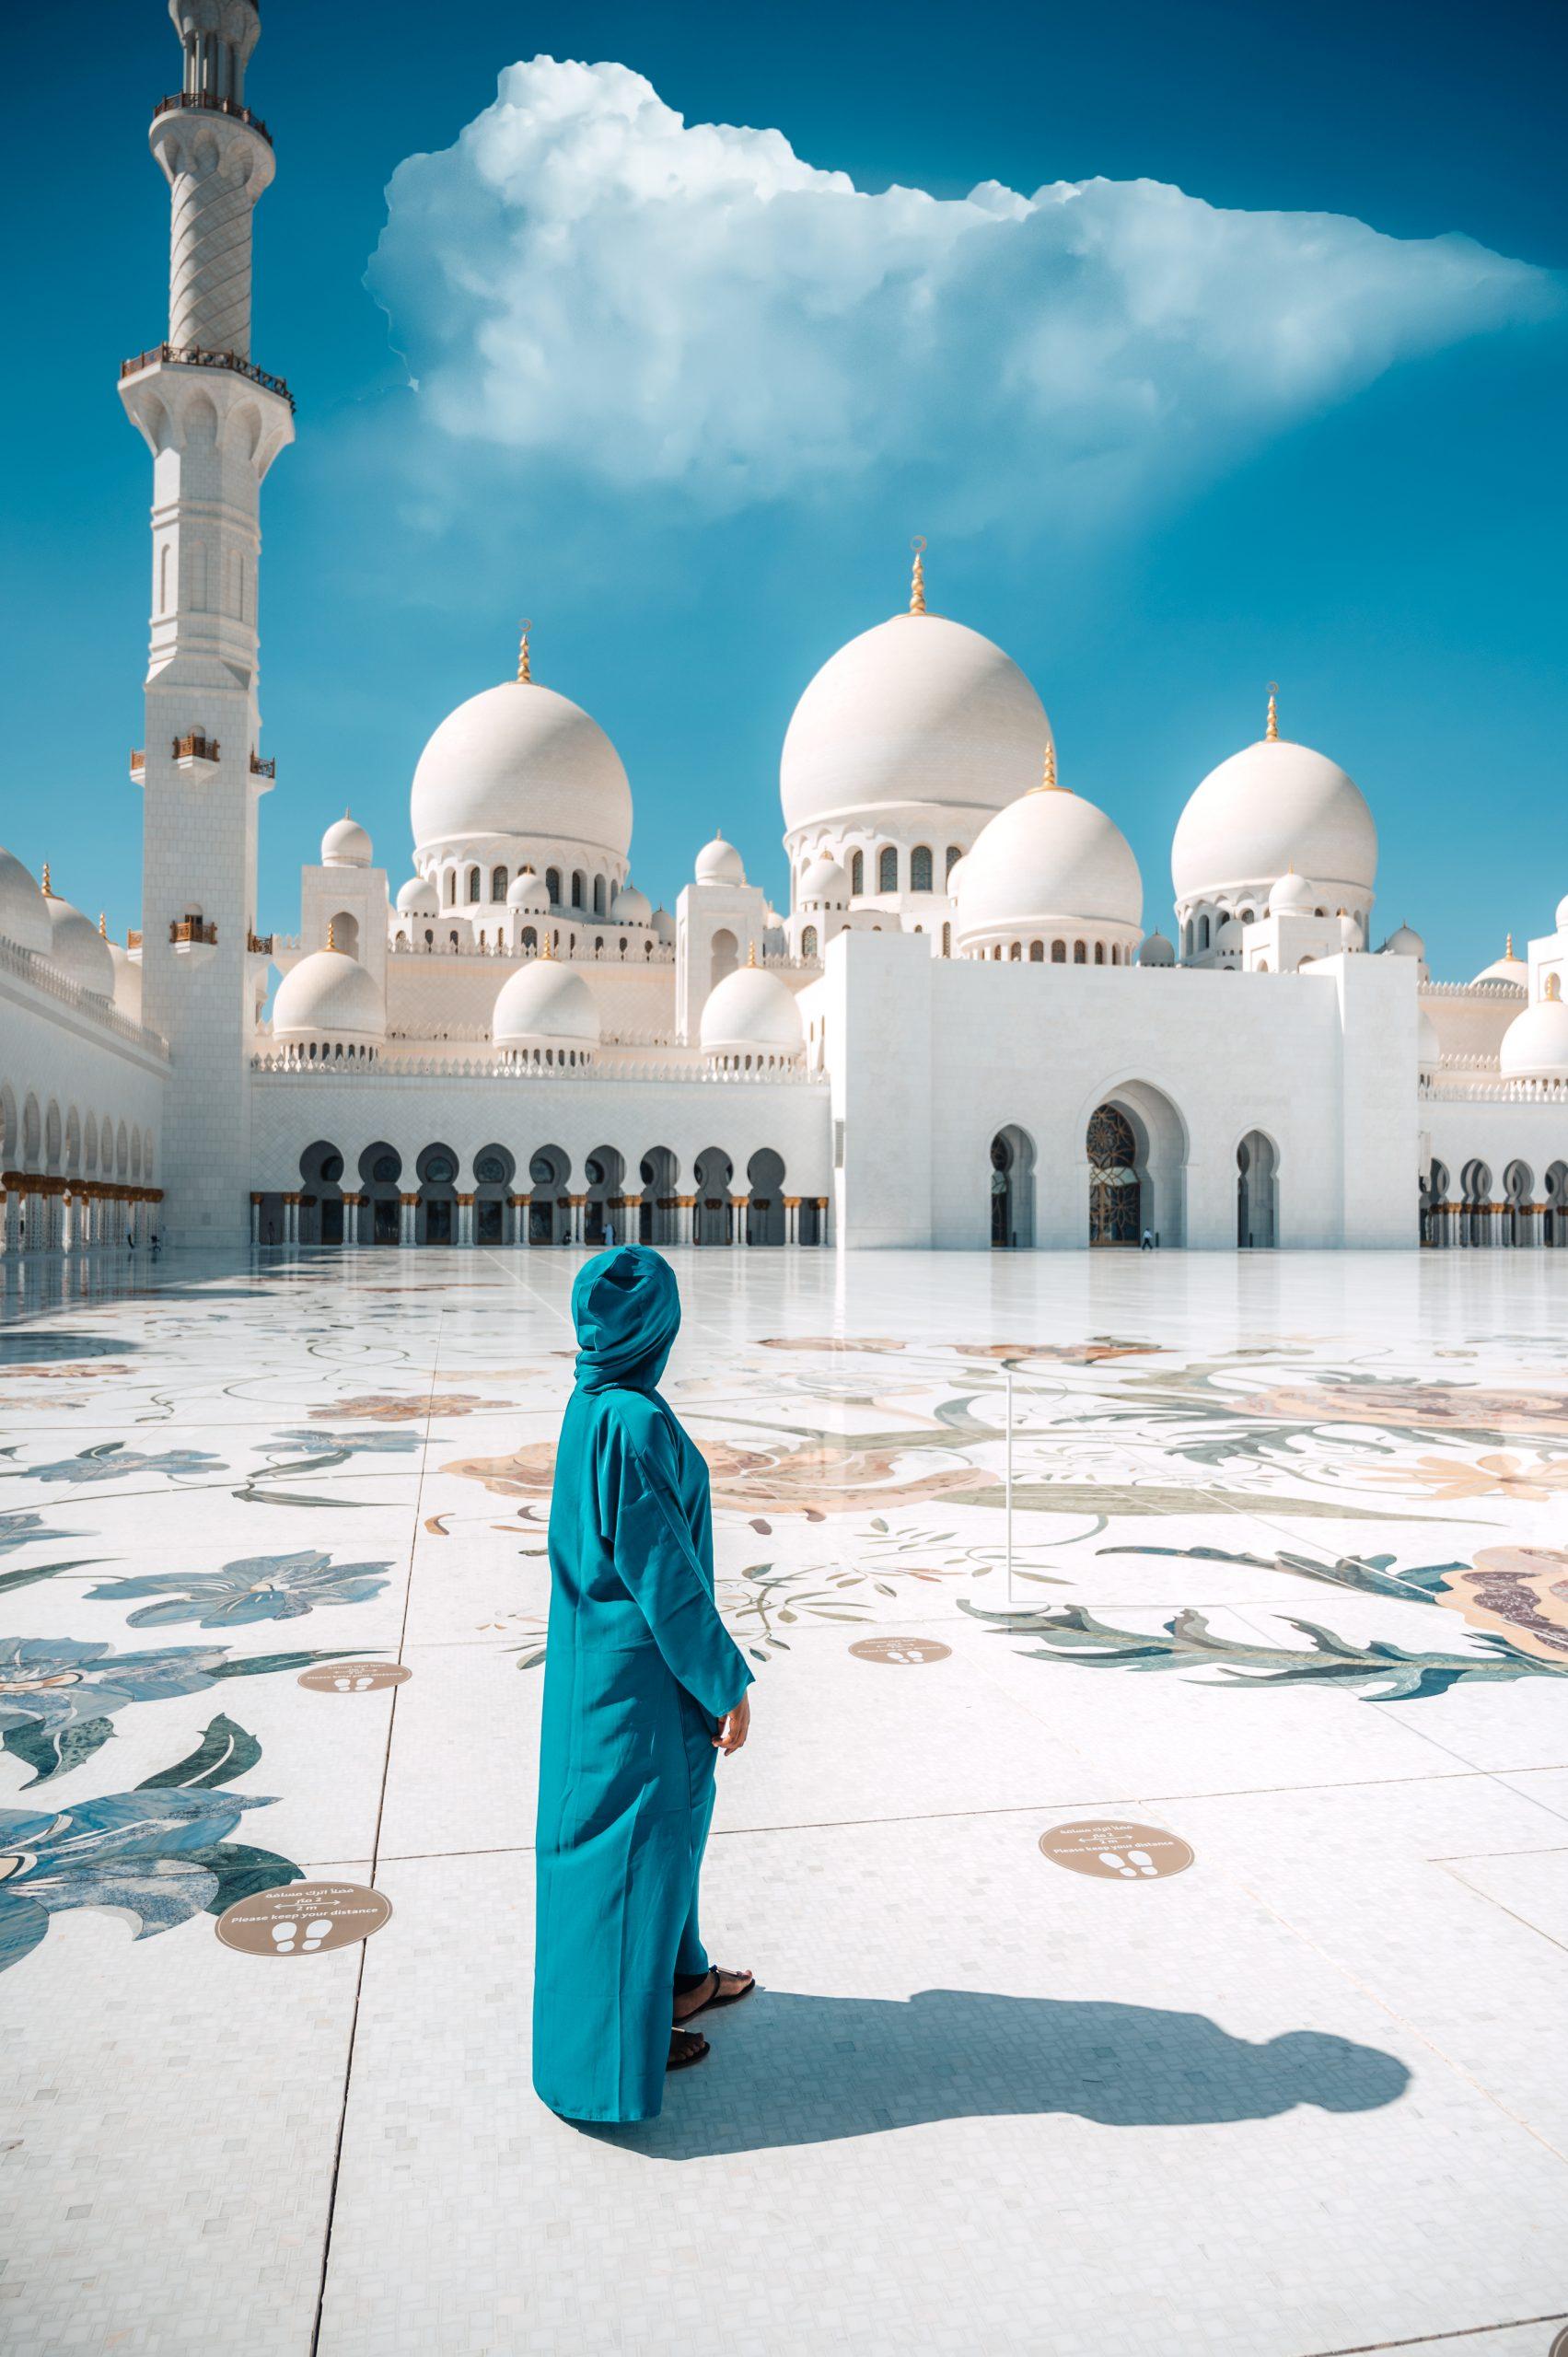 ashleighrm standing in sheikh zayed mosque courtyard